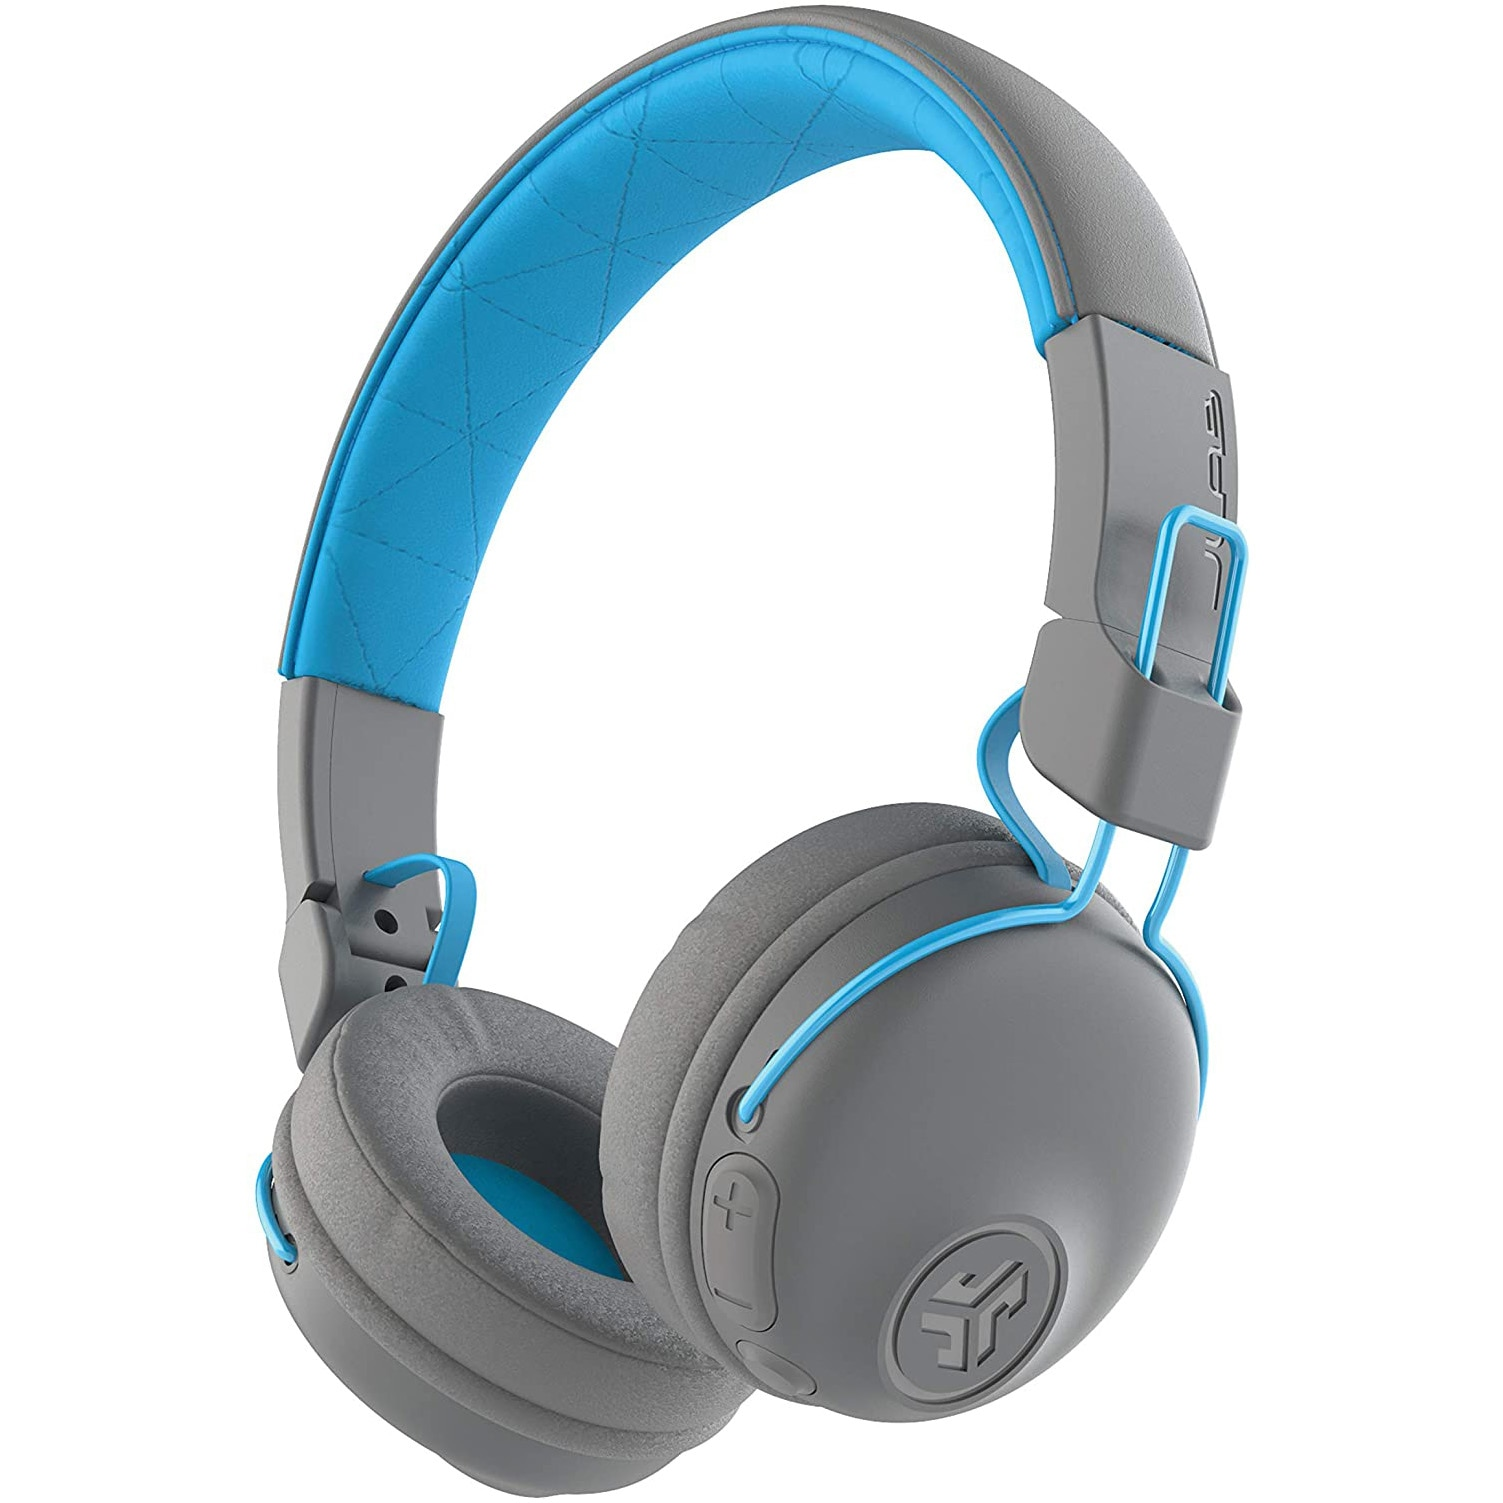 Fotografie Casti Audio On ear JLAB Studio, Wireless, Bluetooth, Functie Bass, Microfon, Autonomie 30 ore, Gri